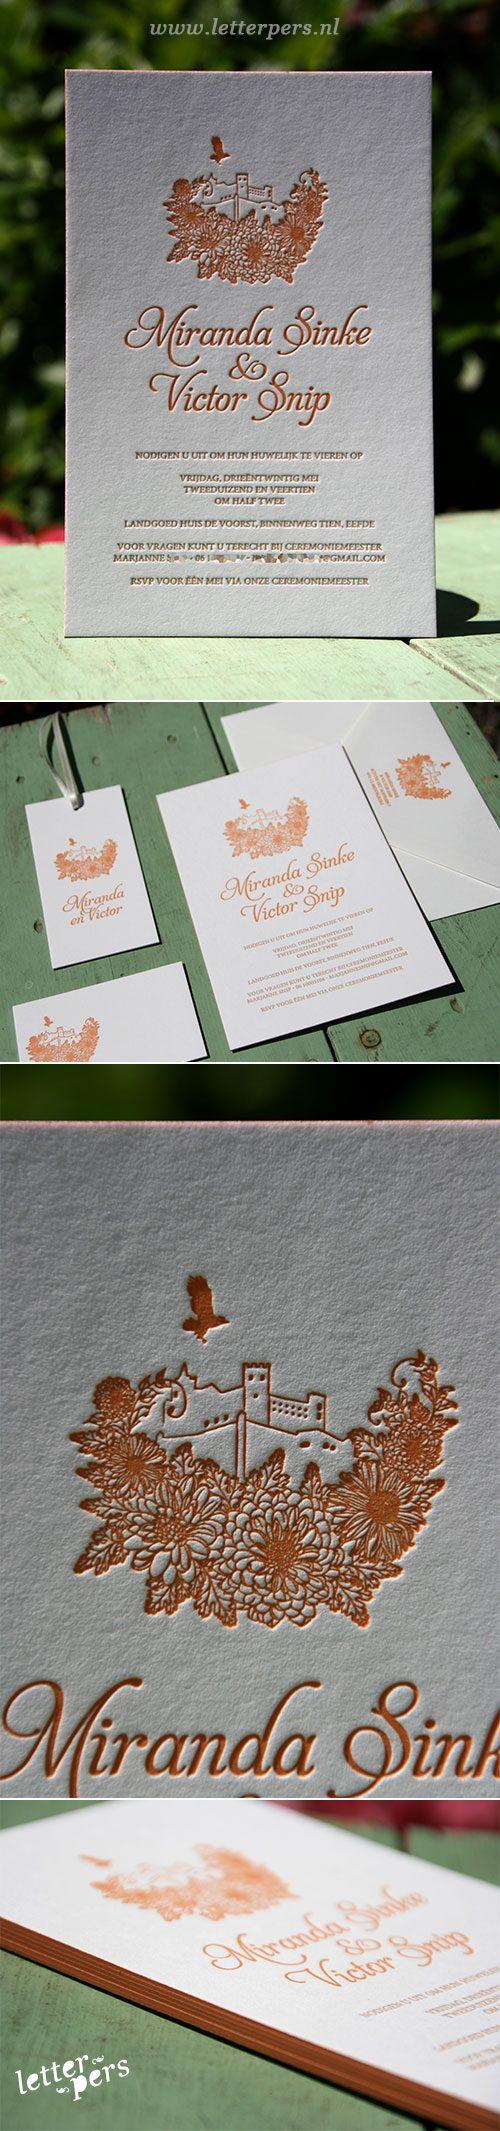 letterpers_letterpress_trouwkaart_-miranda_victor_koper_landgoed_klassiek_kleuropsnede